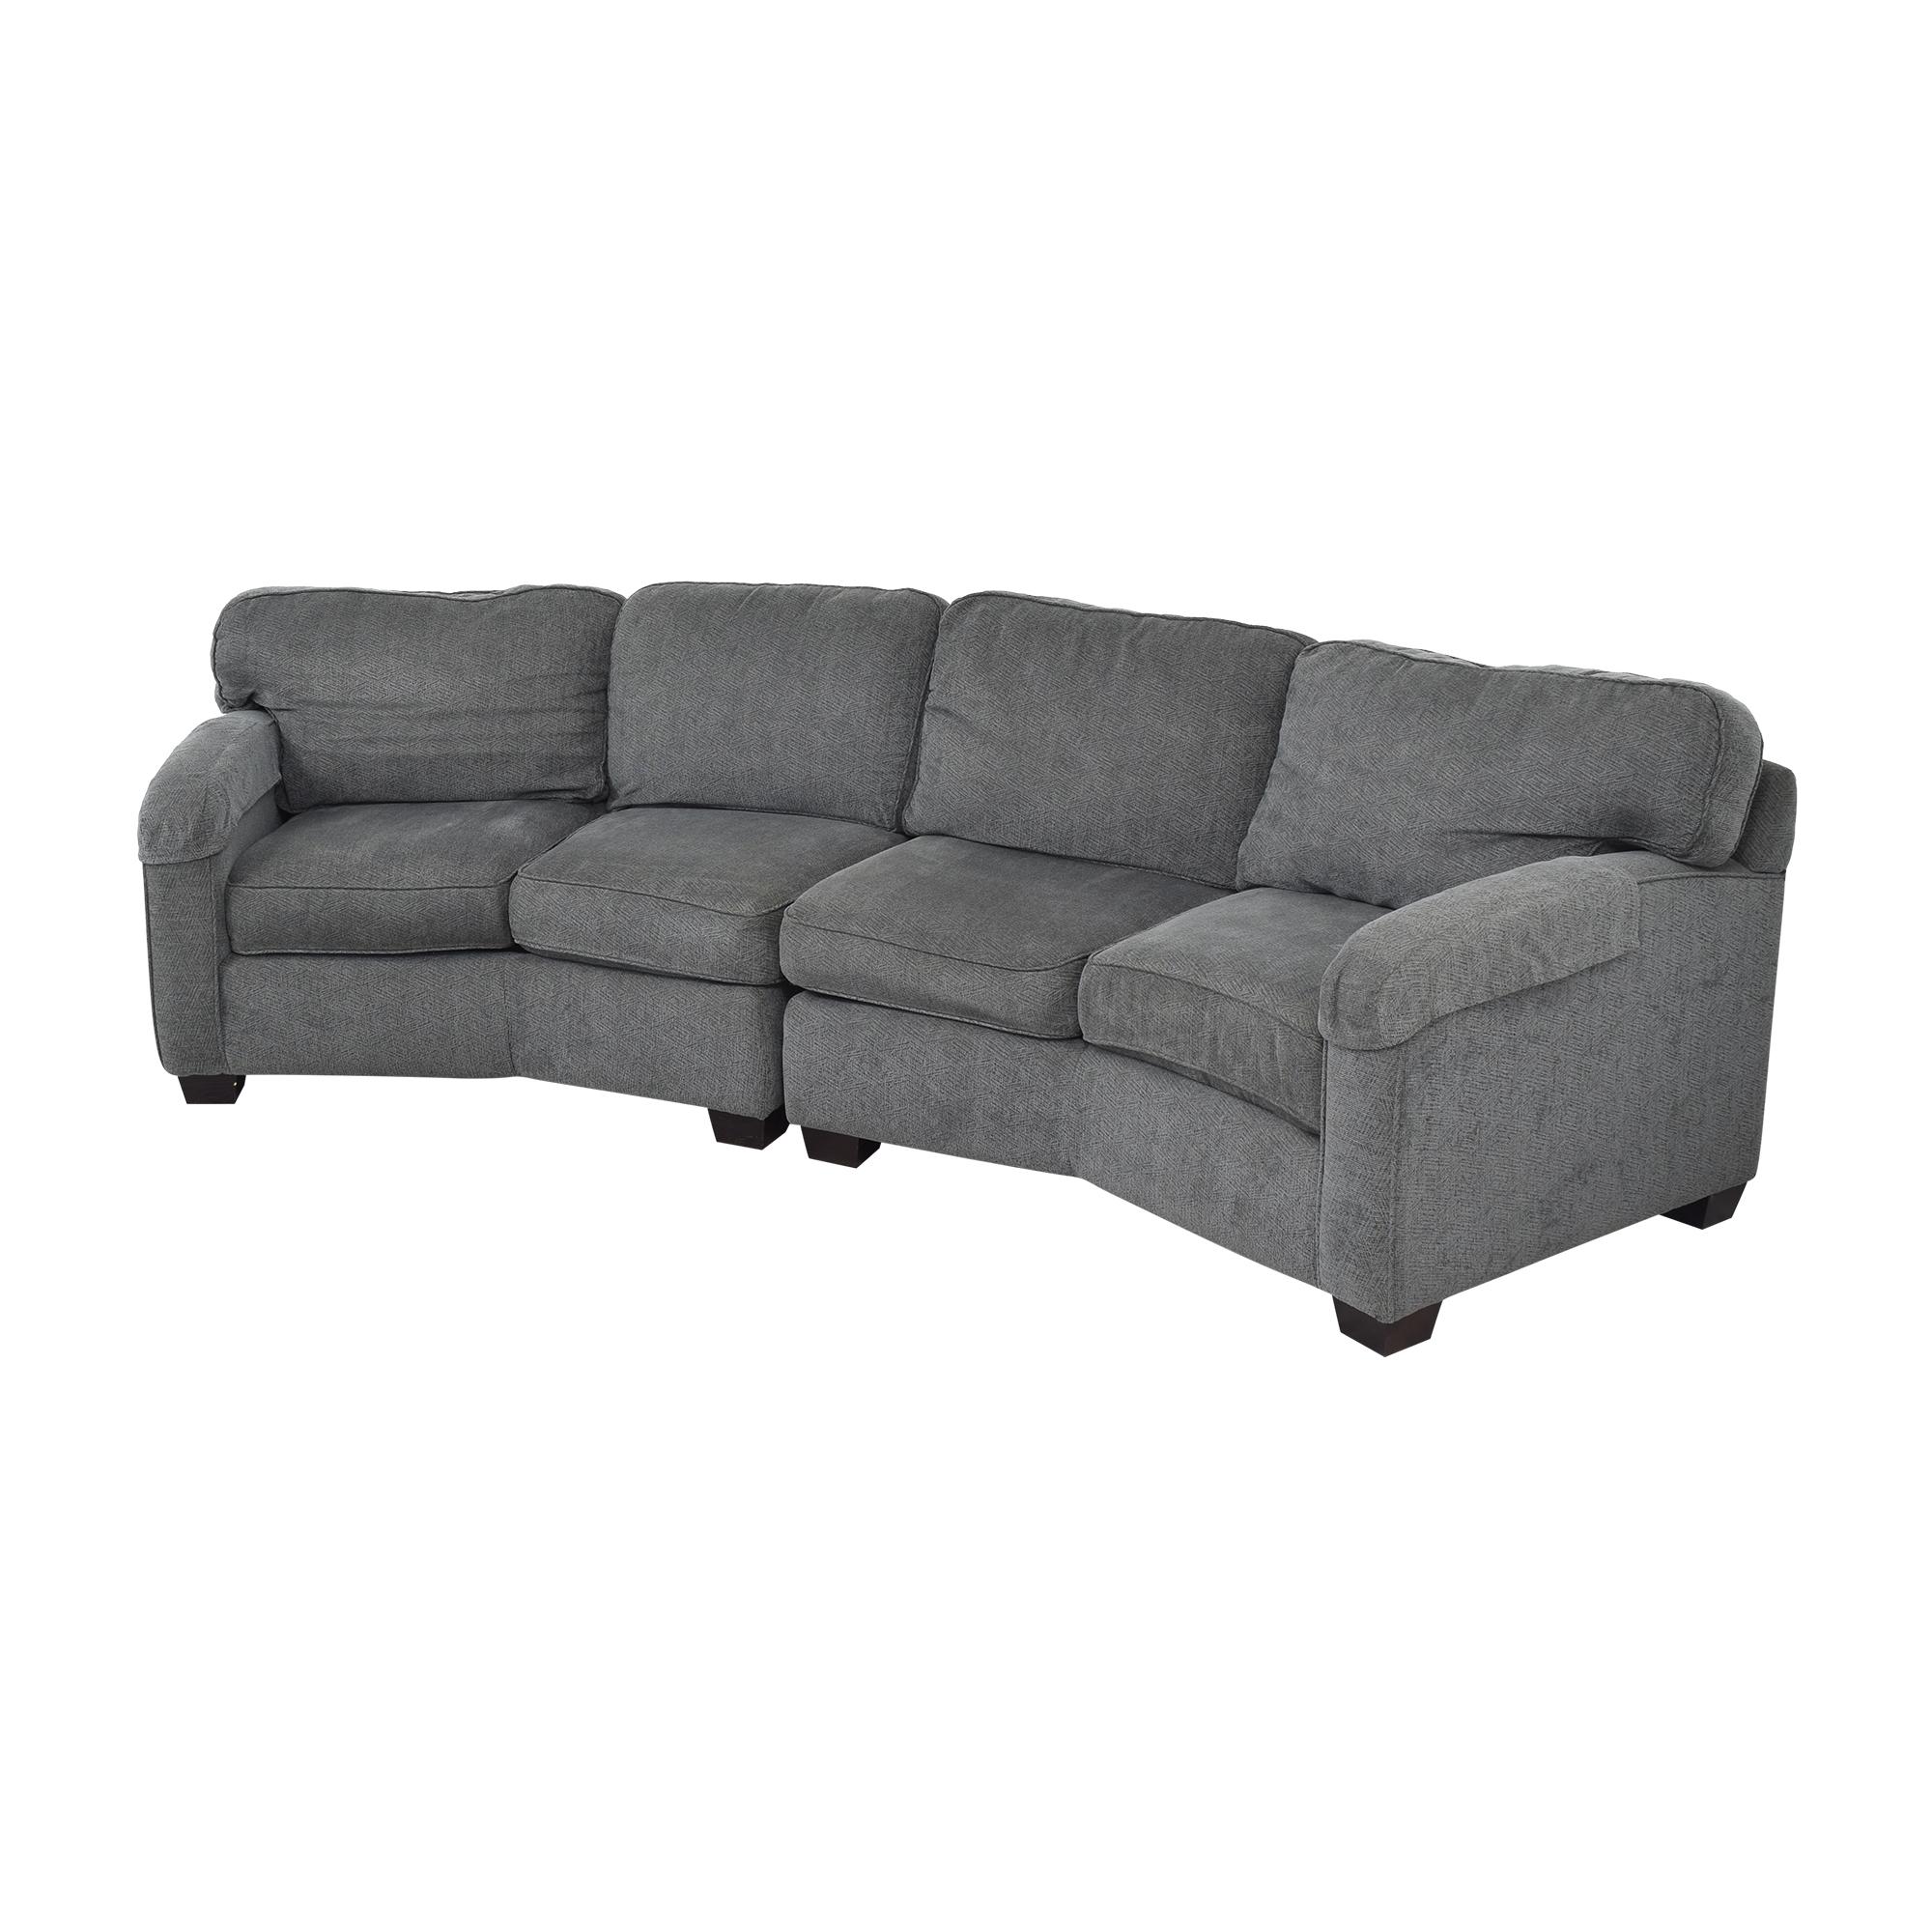 Bassett Furniture Bassett Furniture Sectional Sofa with Ottomans ma